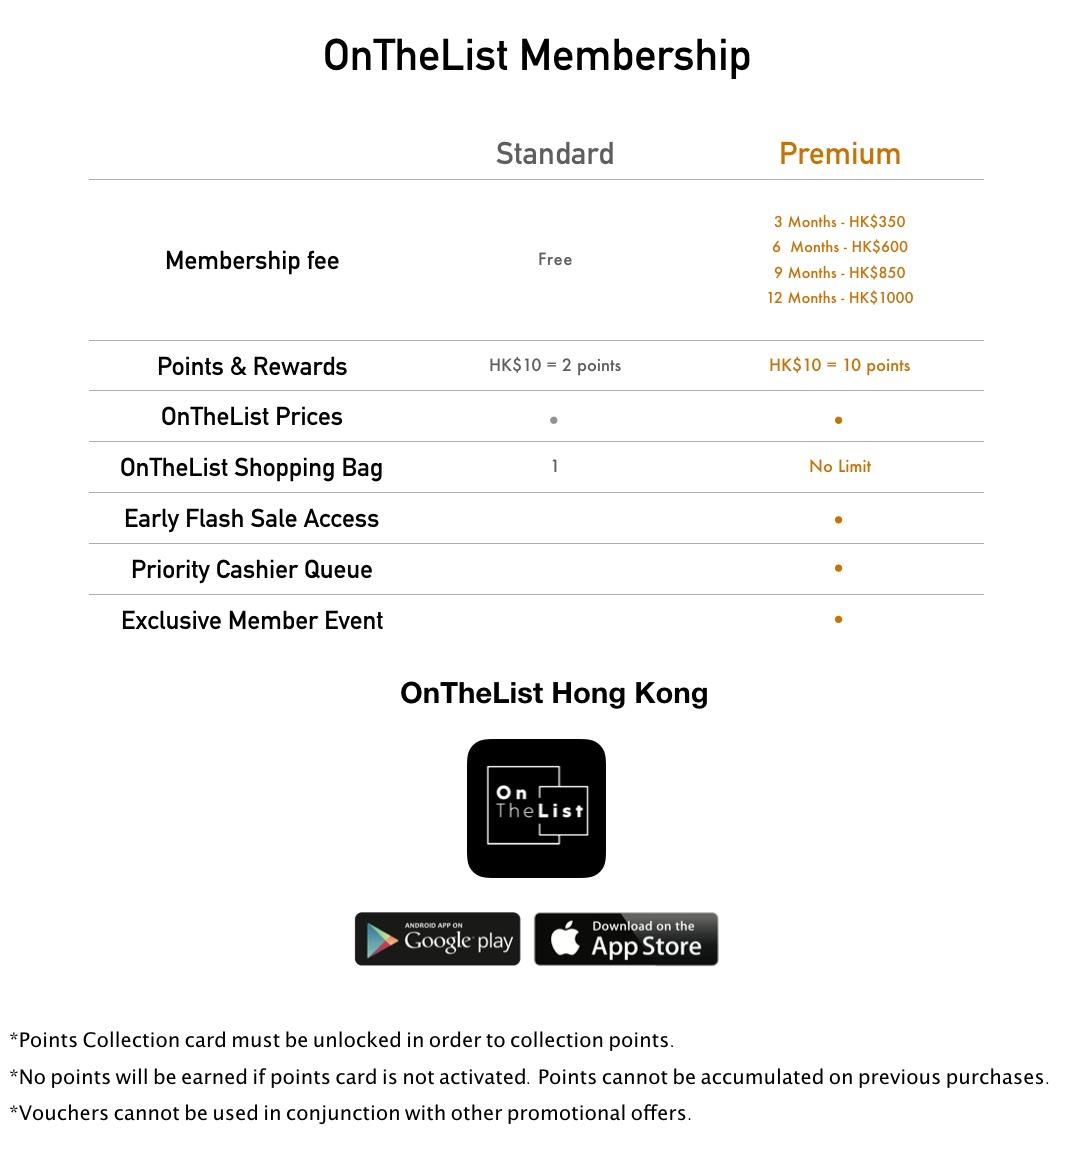 On The List Premium